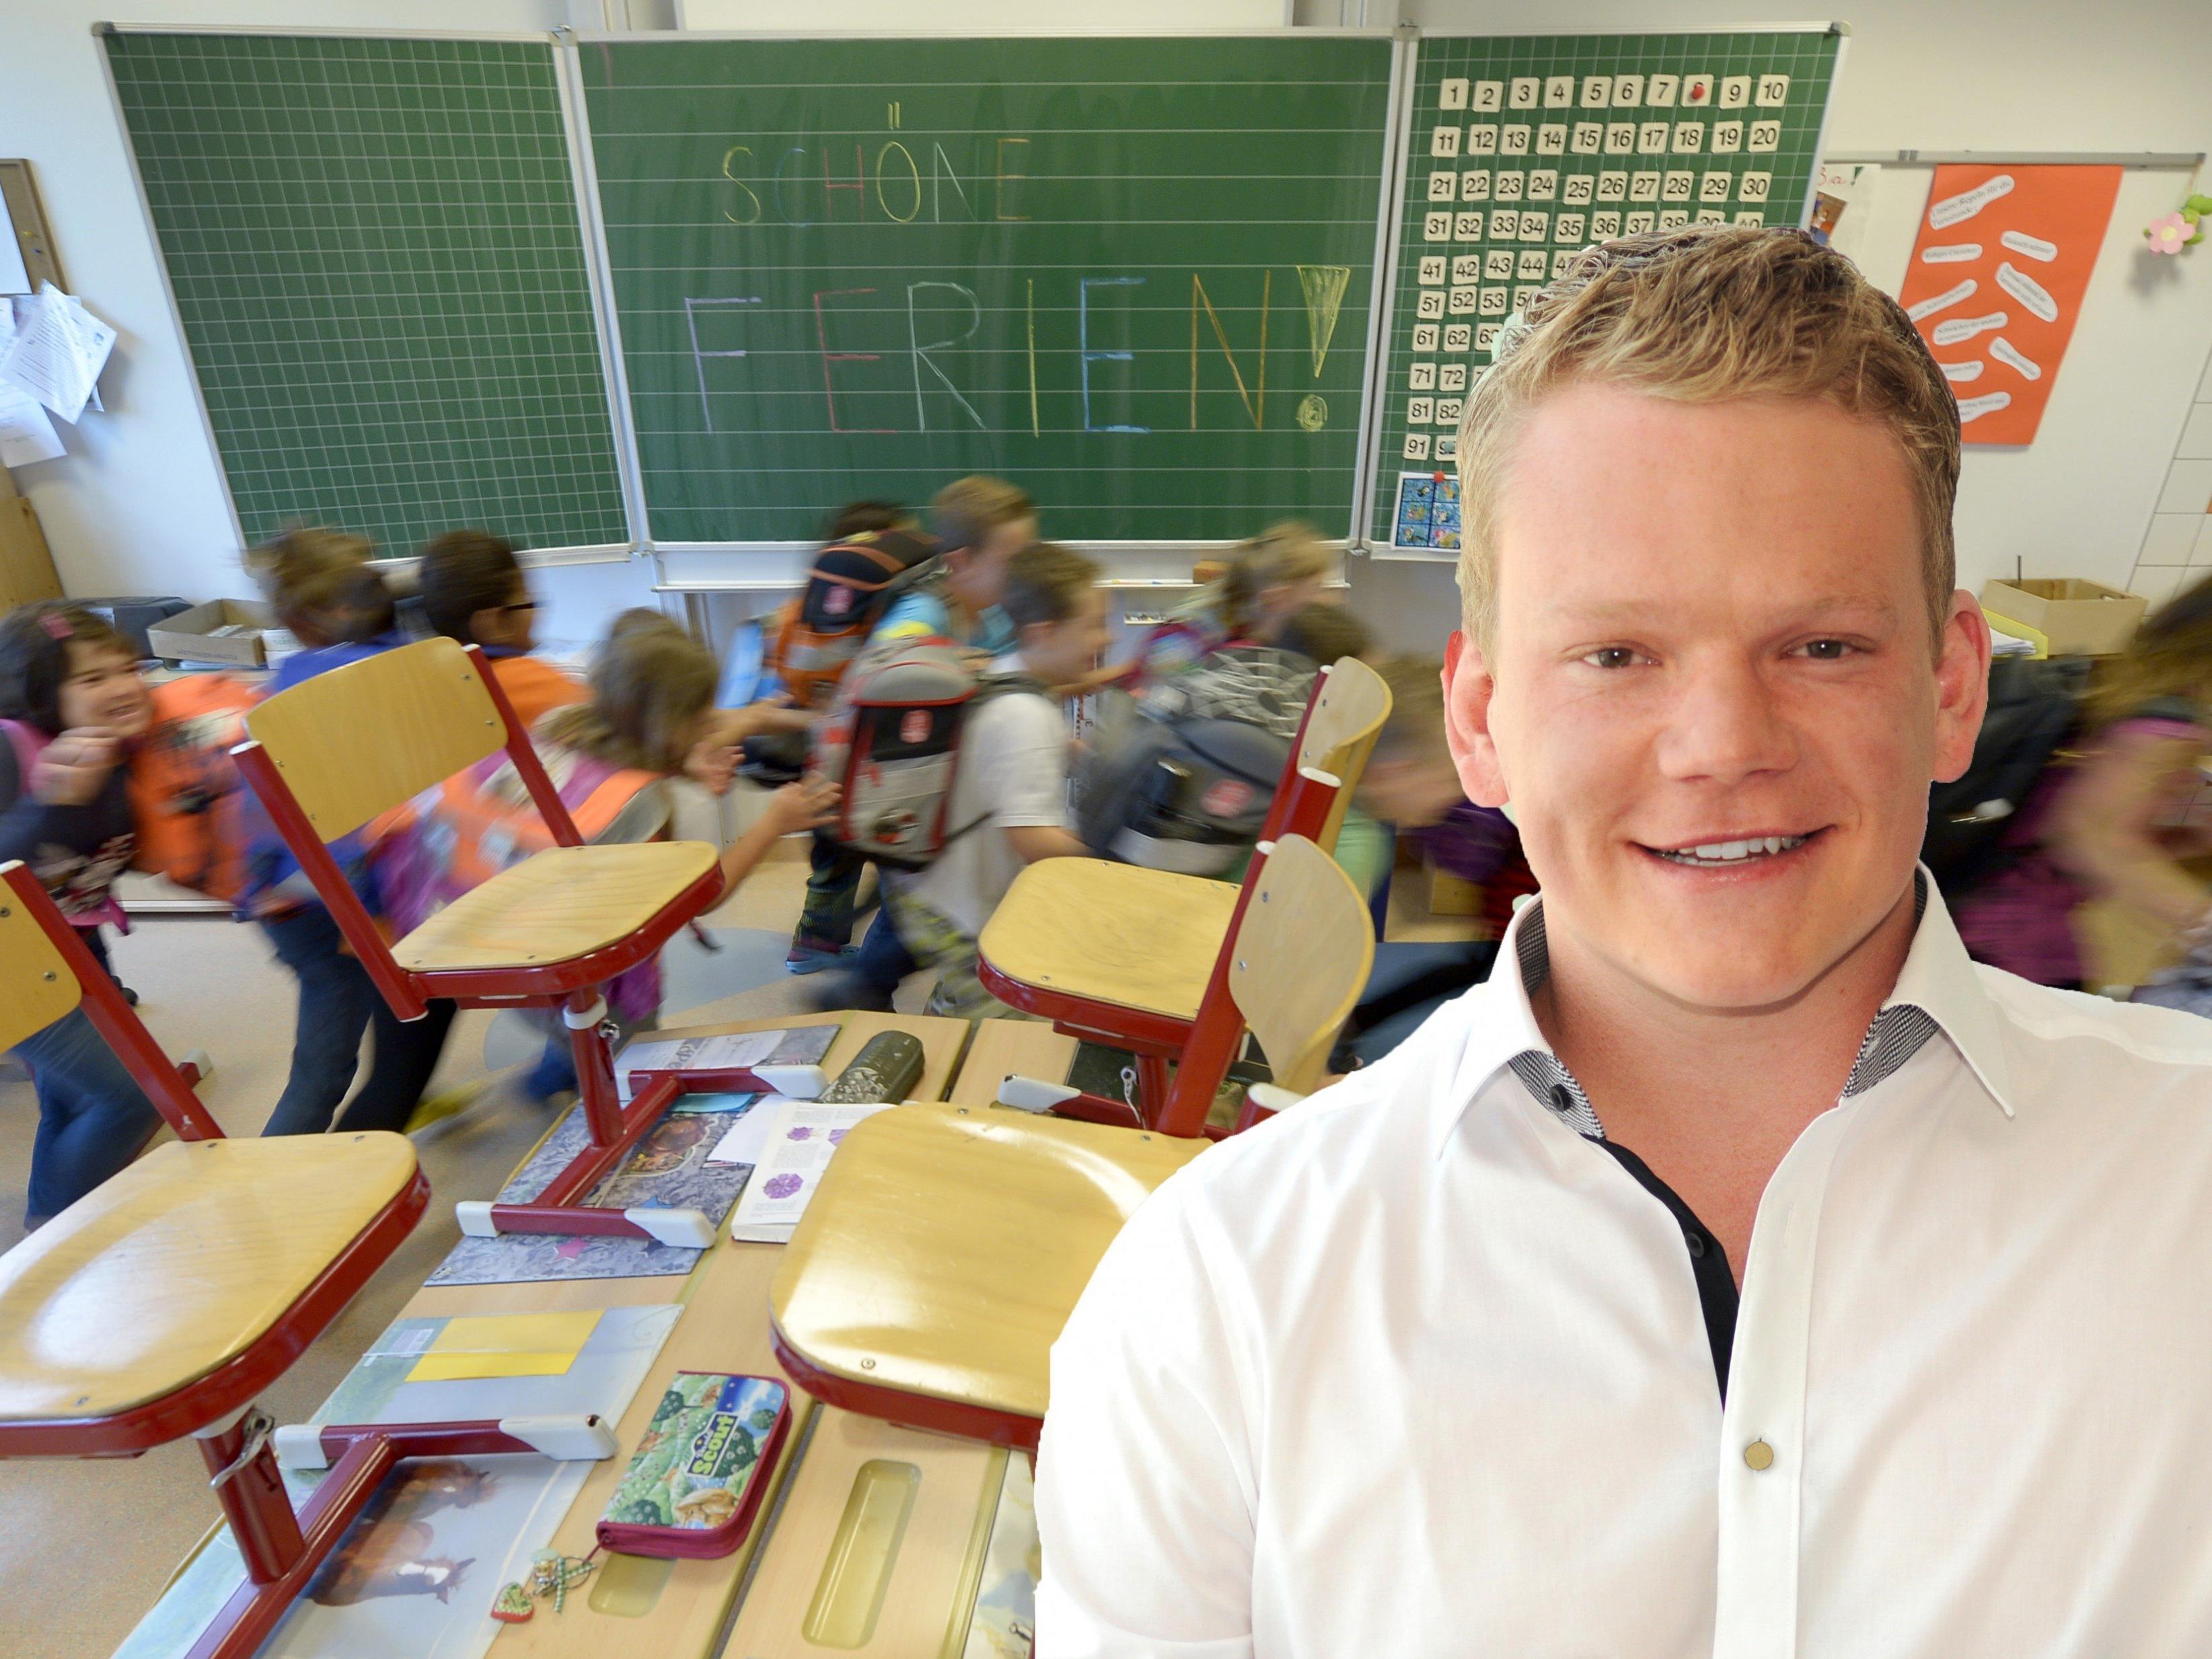 FPÖ-Jugendsprecher Christof Bitschi